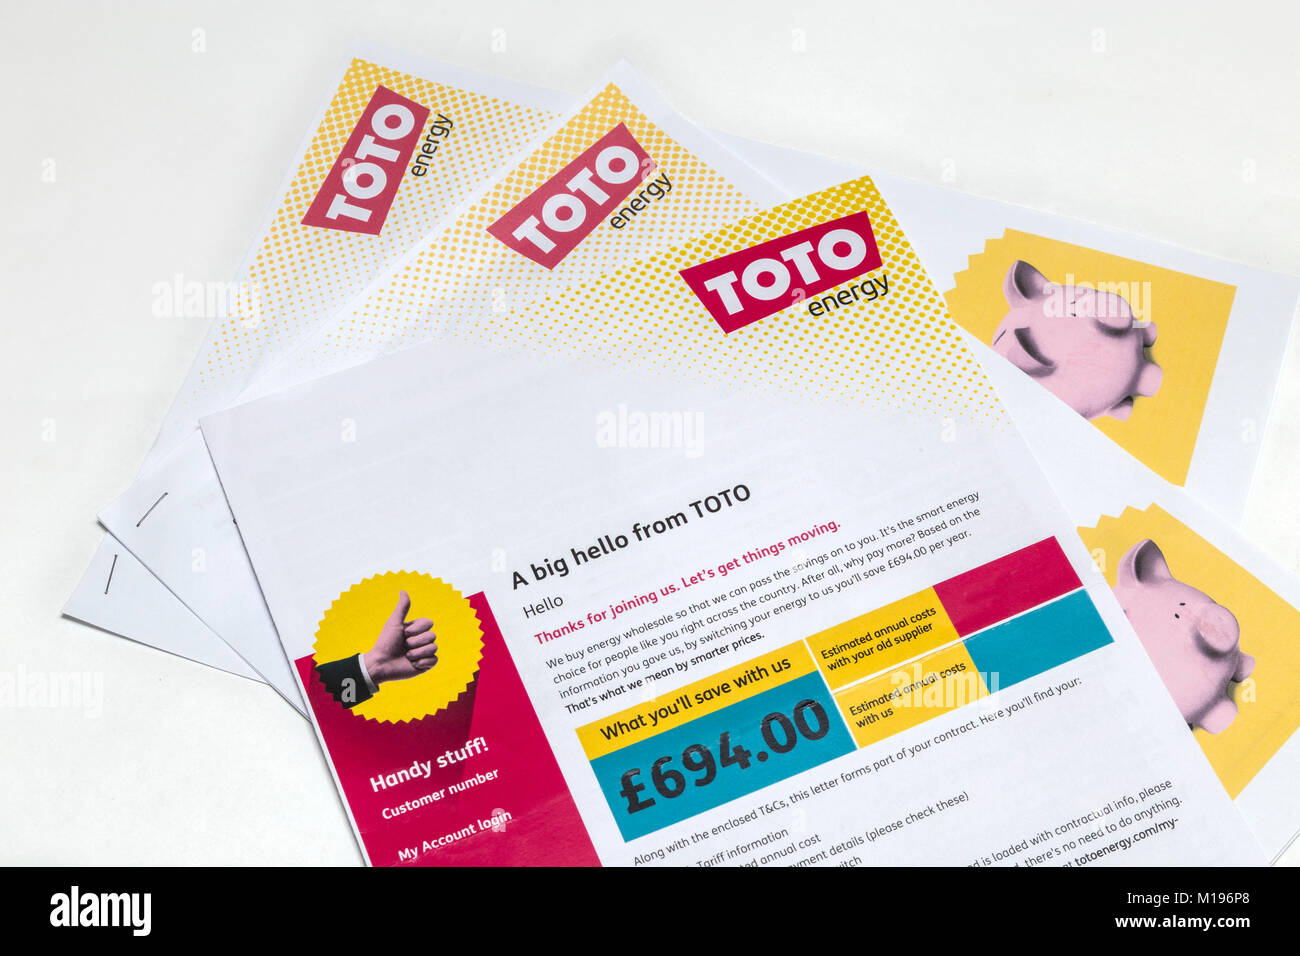 TOTO energy literature.Toto, a small supplier based in Brighton ...